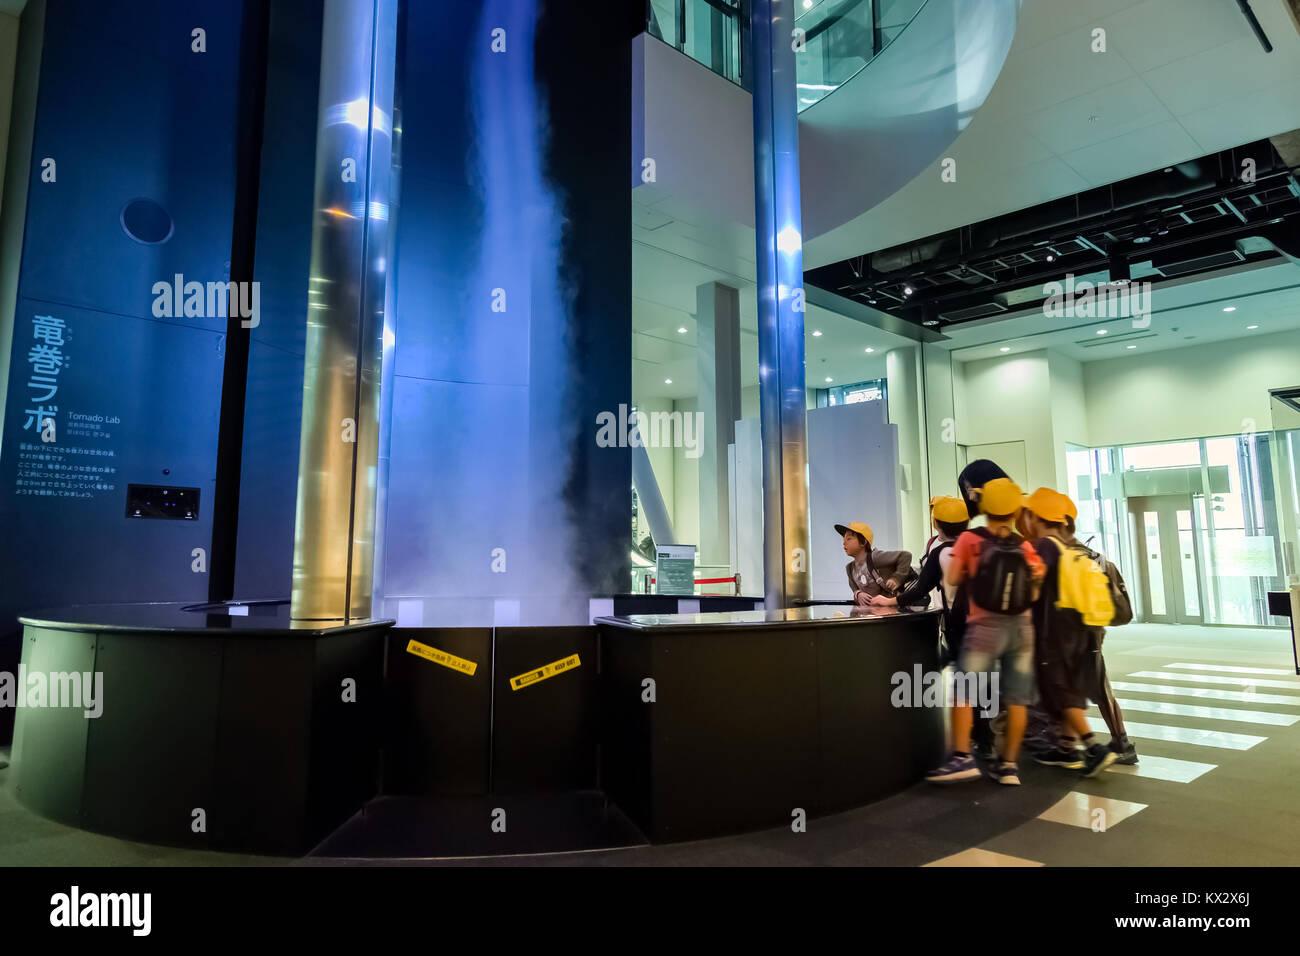 NAGOYA, JAPAN - NOVEMBER 18, 2015: Clary storm simulator displayed at Nagoya City Science Museum it portrays life Stock Photo